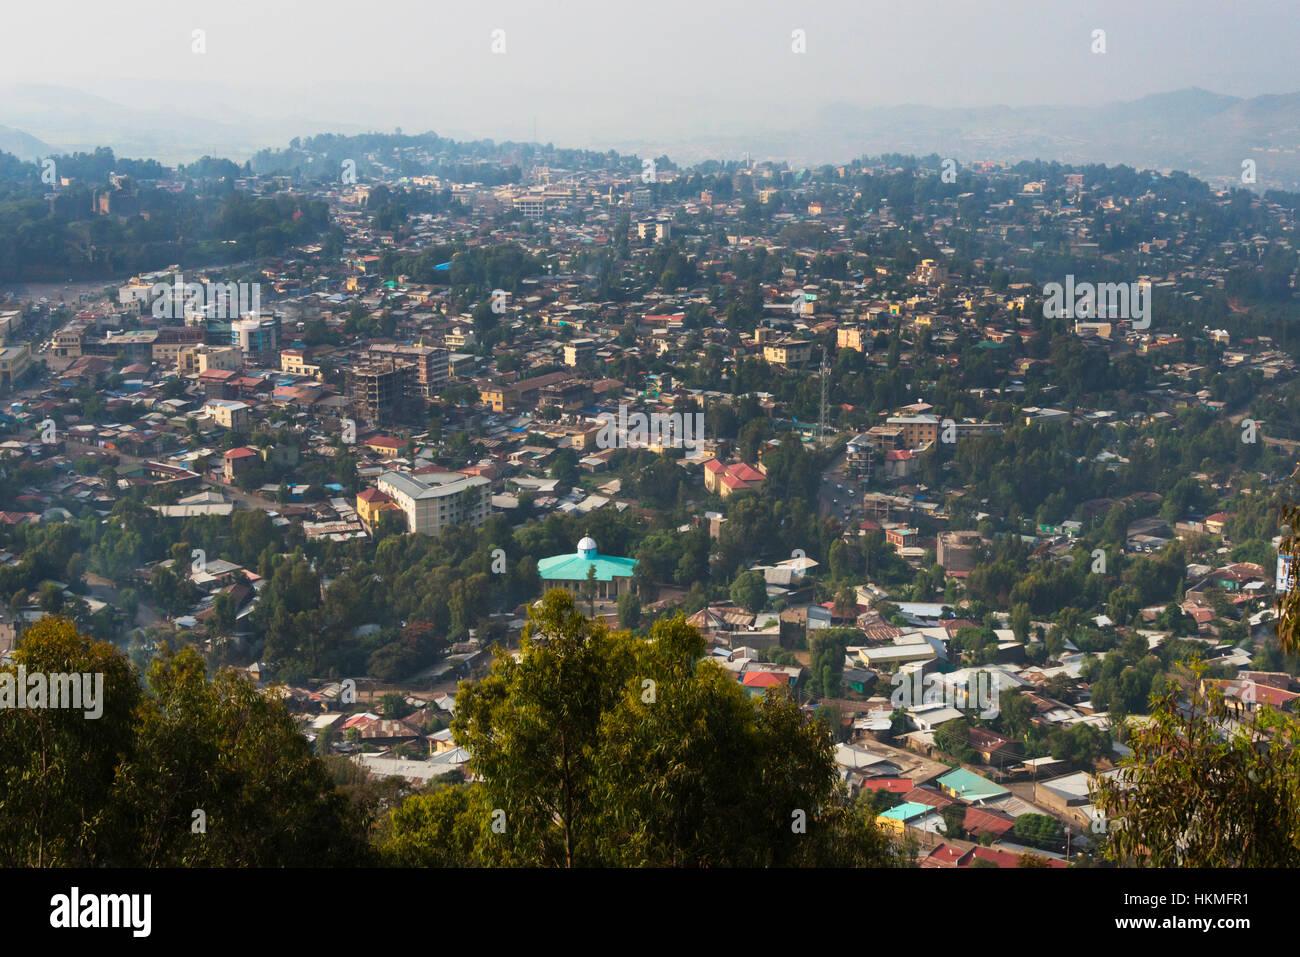 Cityscape of Gondar, Ethiopia - Stock Image